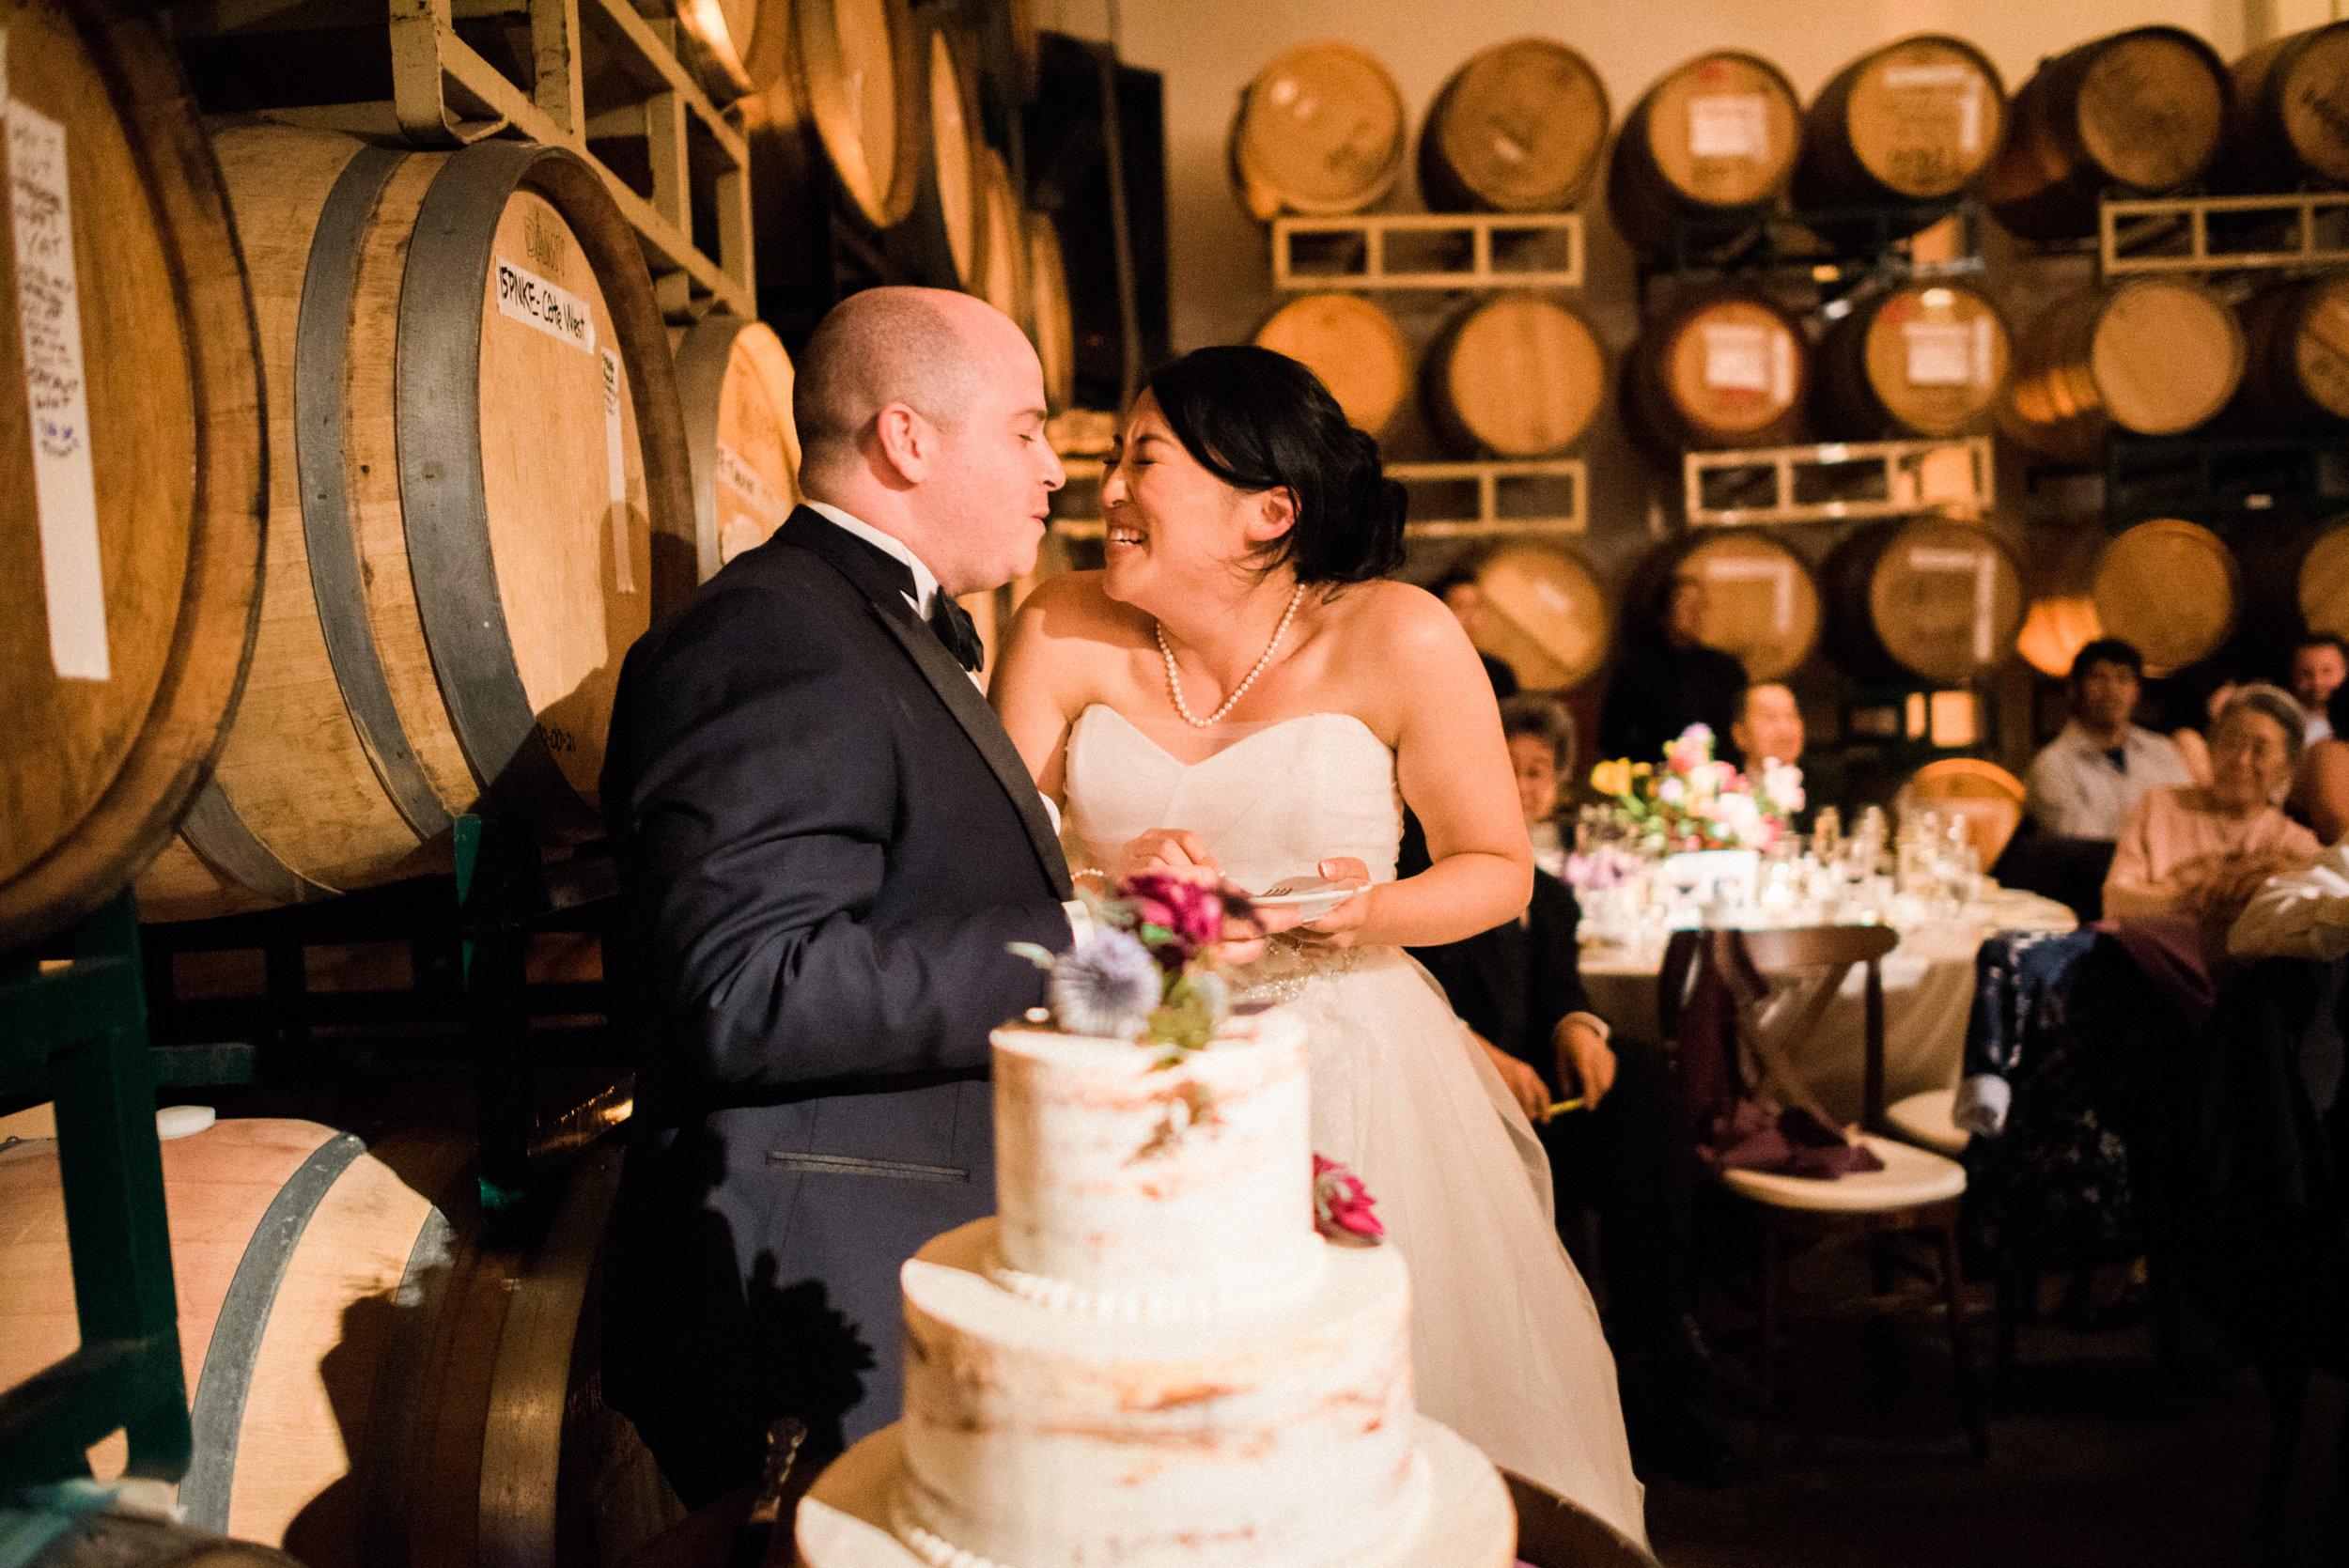 Swedenborgian Church Dogpatch Winery Wedding086.jpg